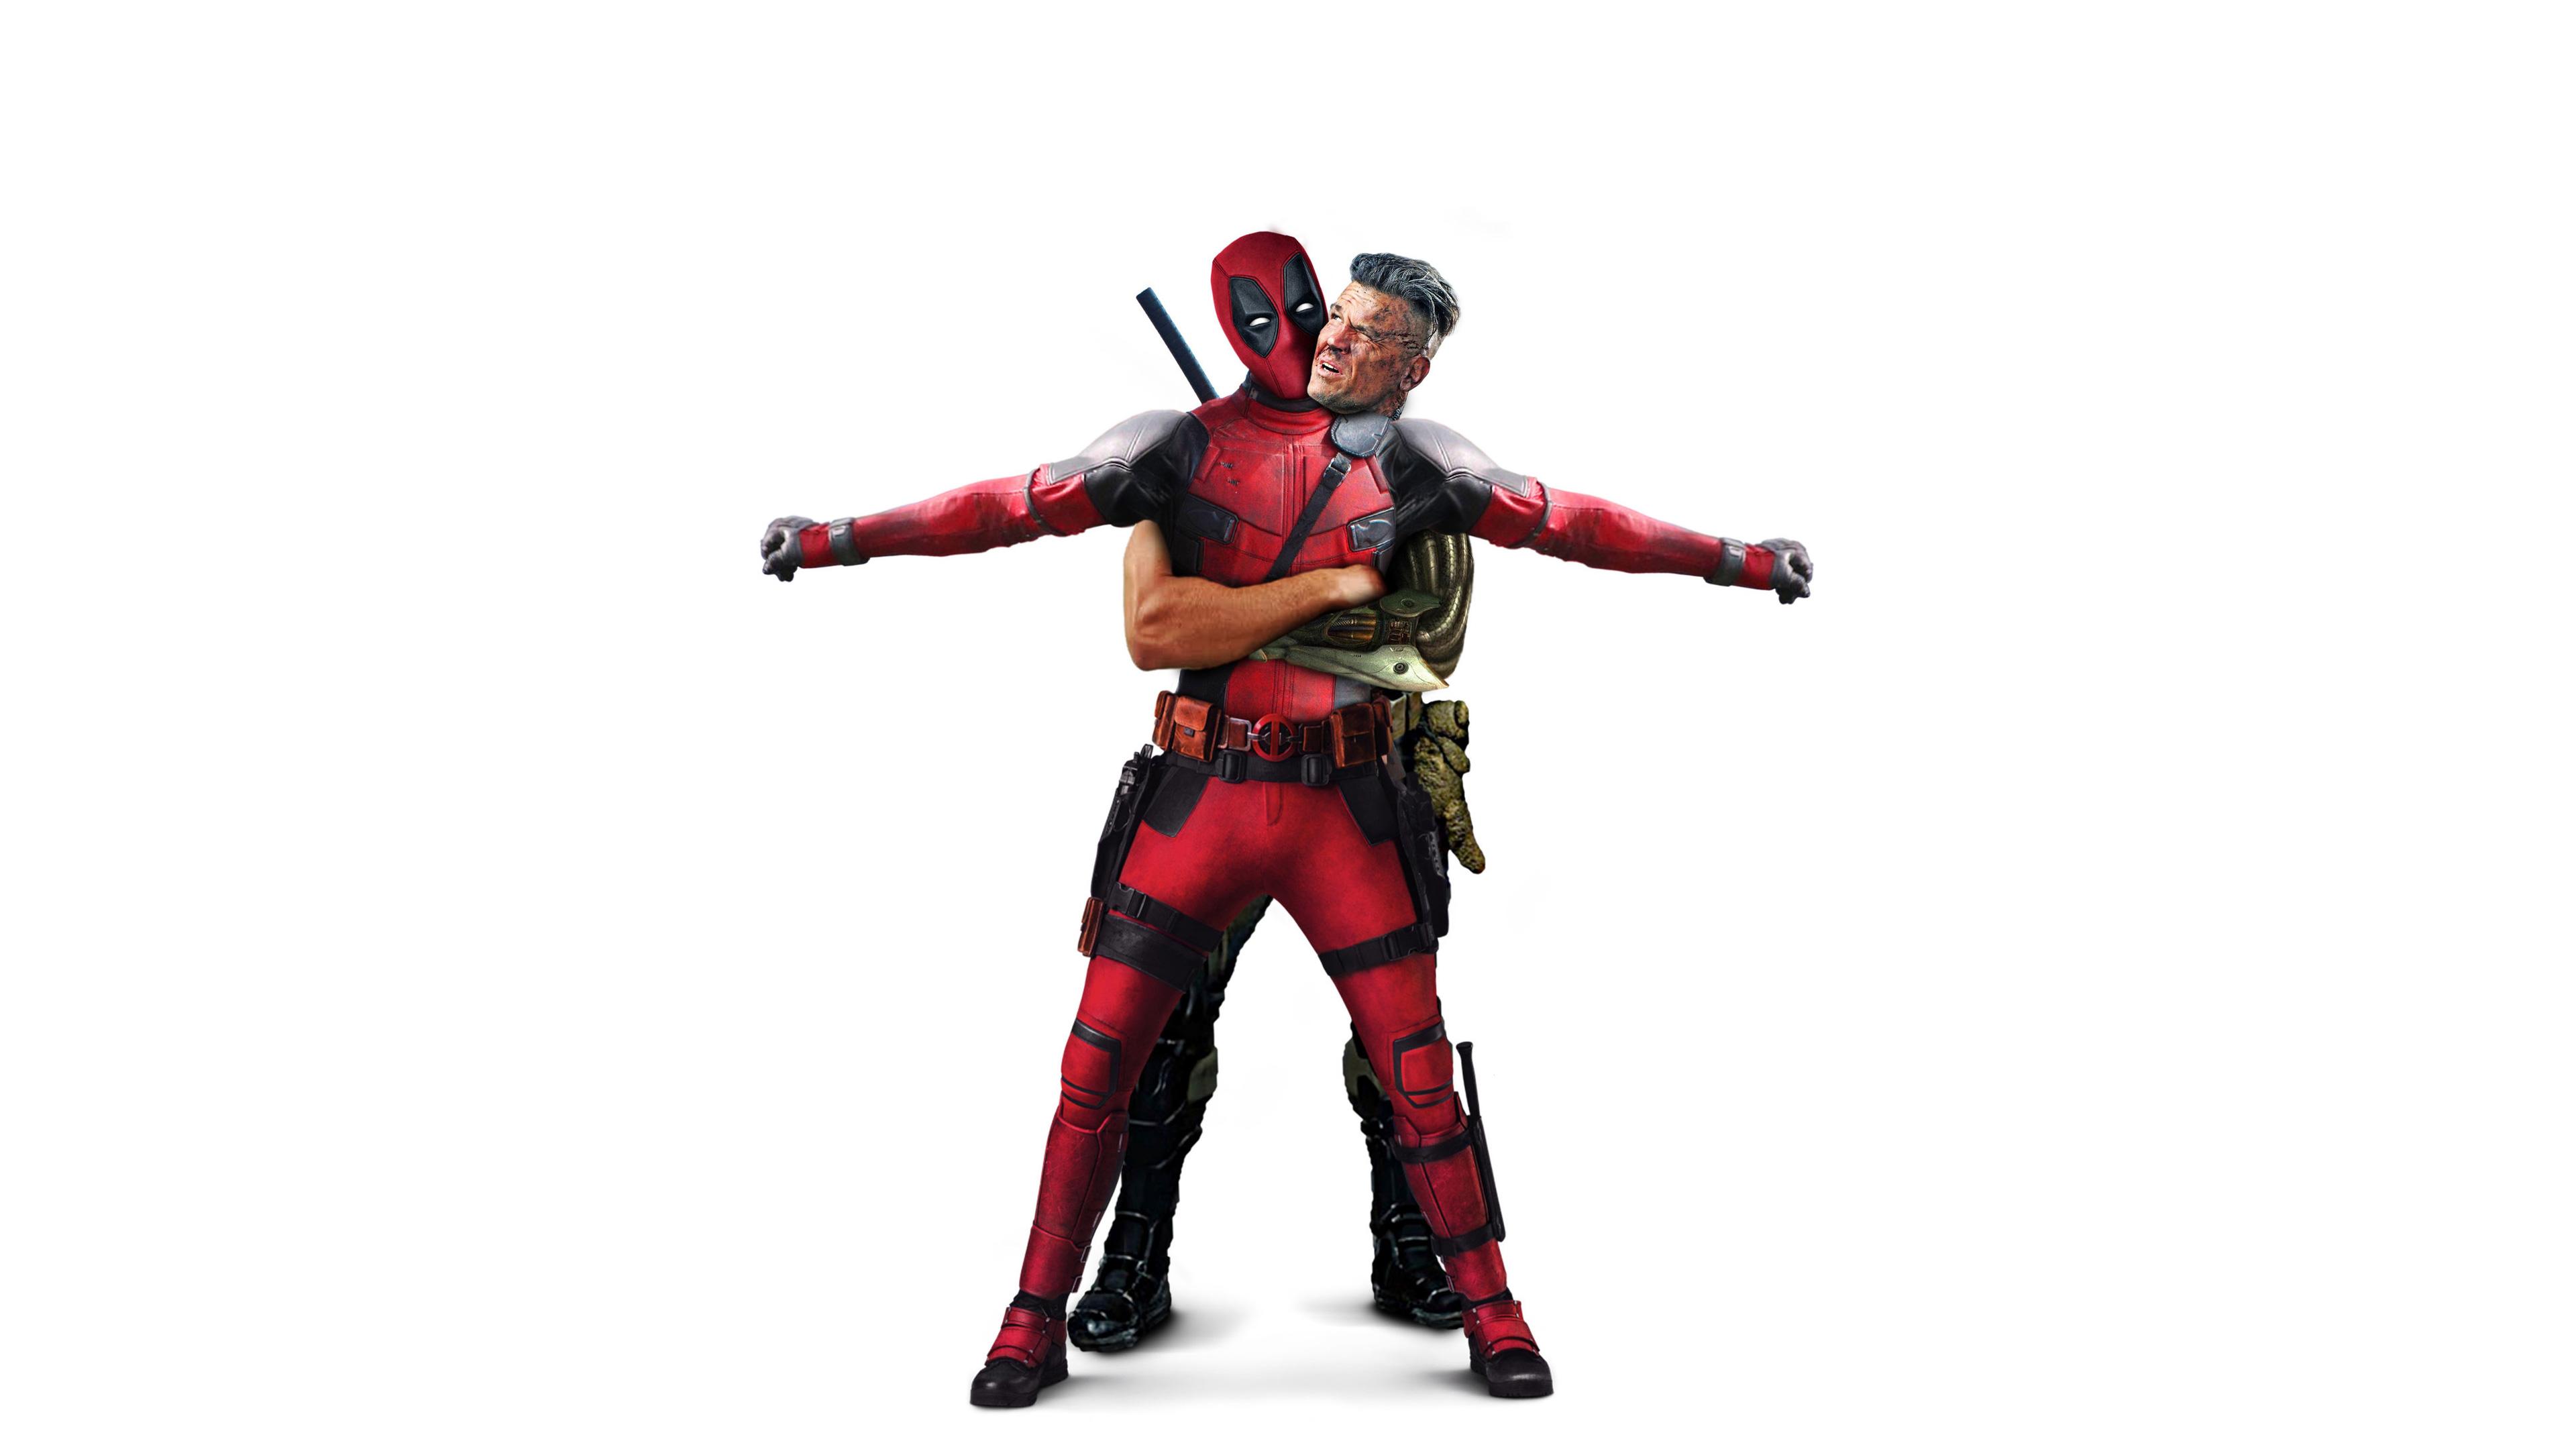 Deadpool 2 Movie 4k - Deadpool 2 Movie 4k - Wallpapers, 4k